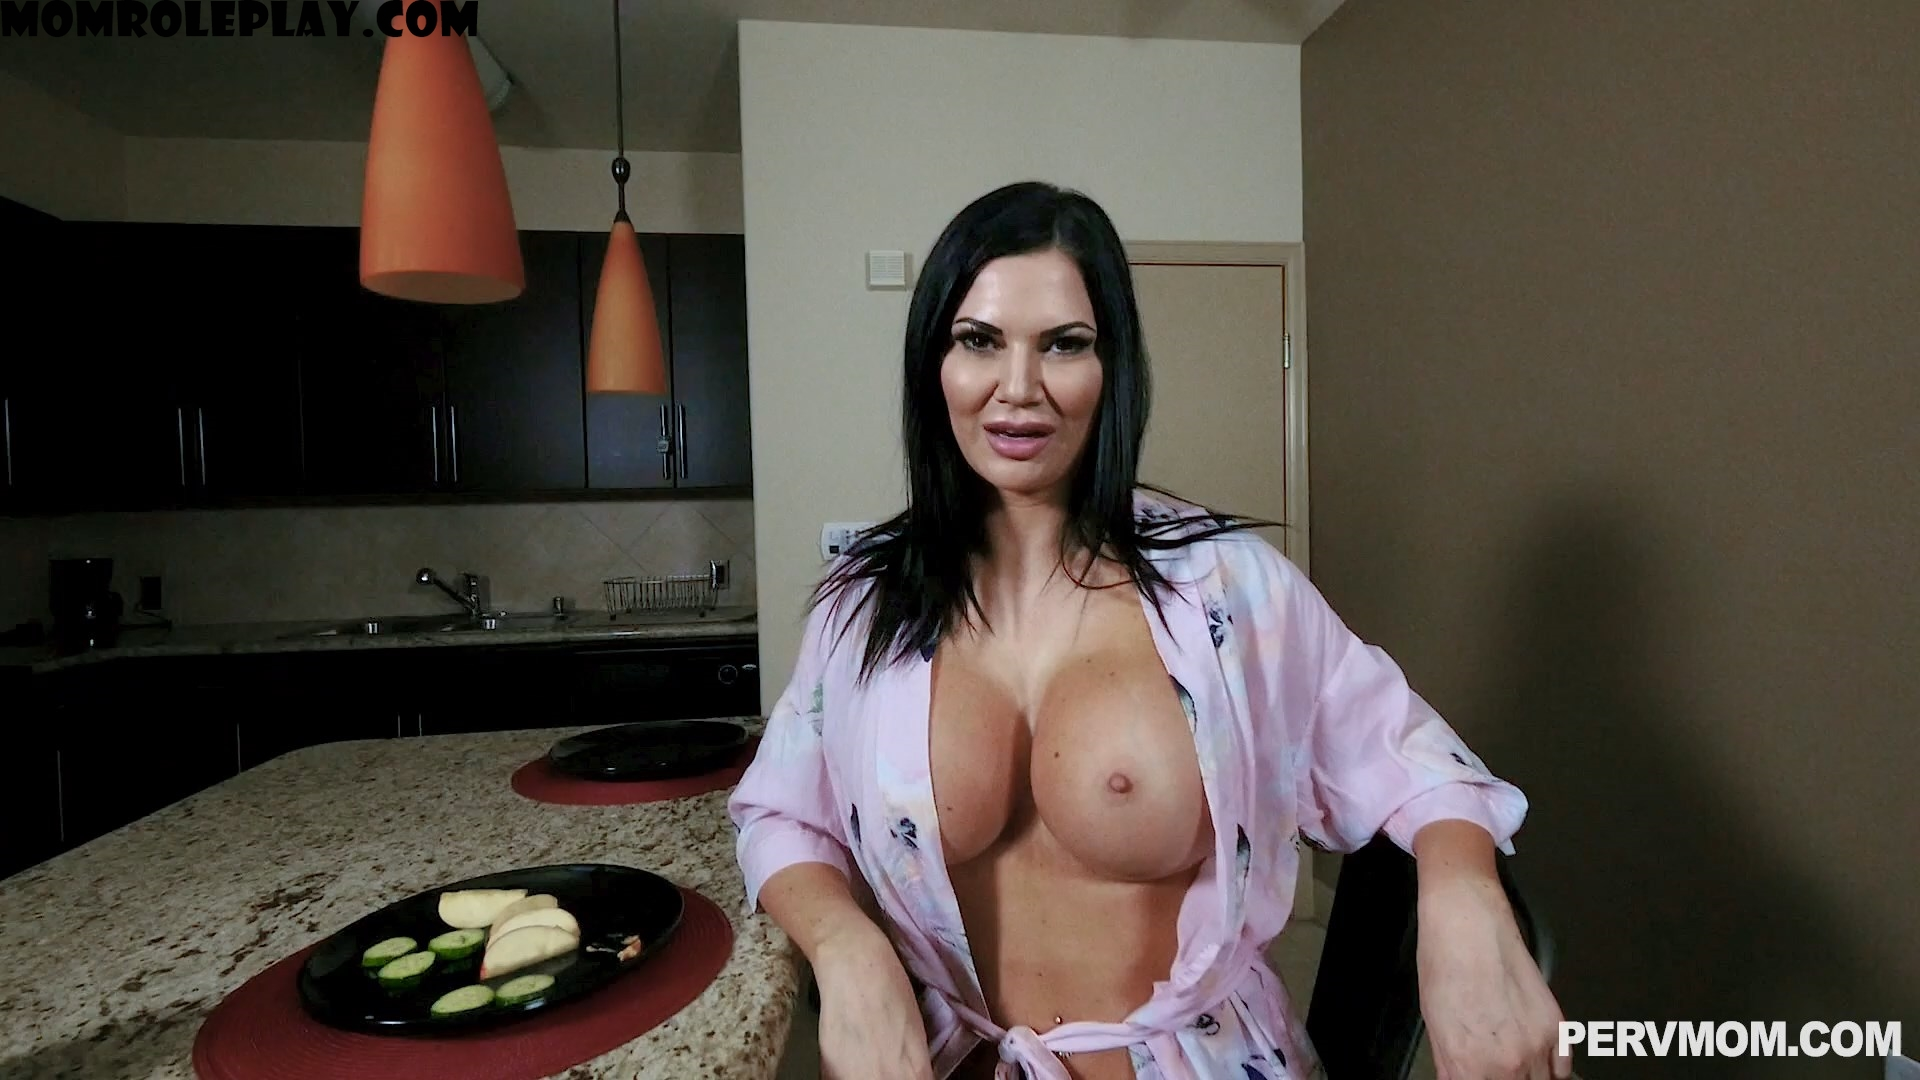 Perv Mom - Jasmine Jae - Masturbation Sensations 1080p